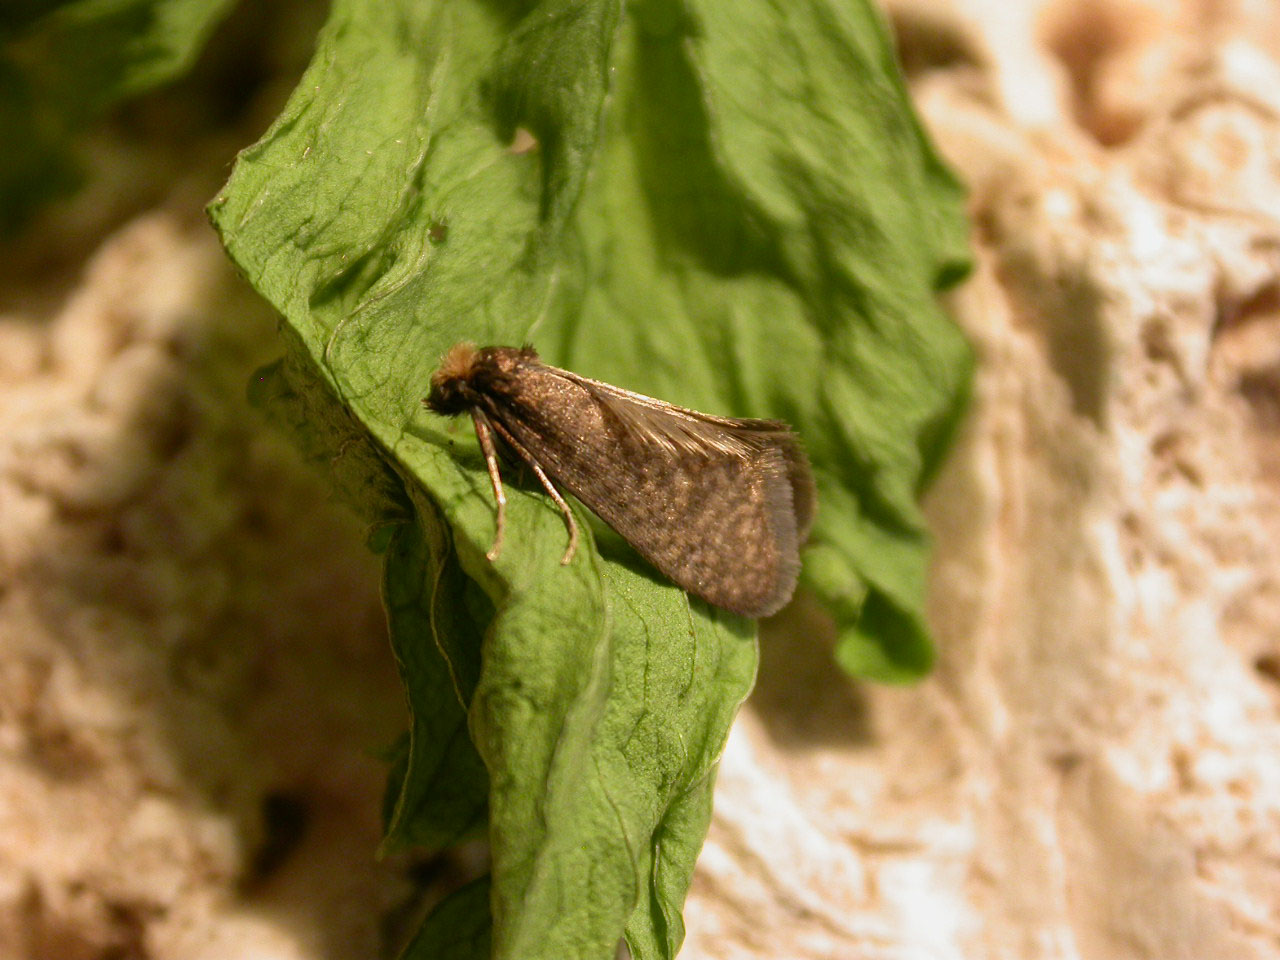 Taleporia tubulosa (lep. Psychidae)